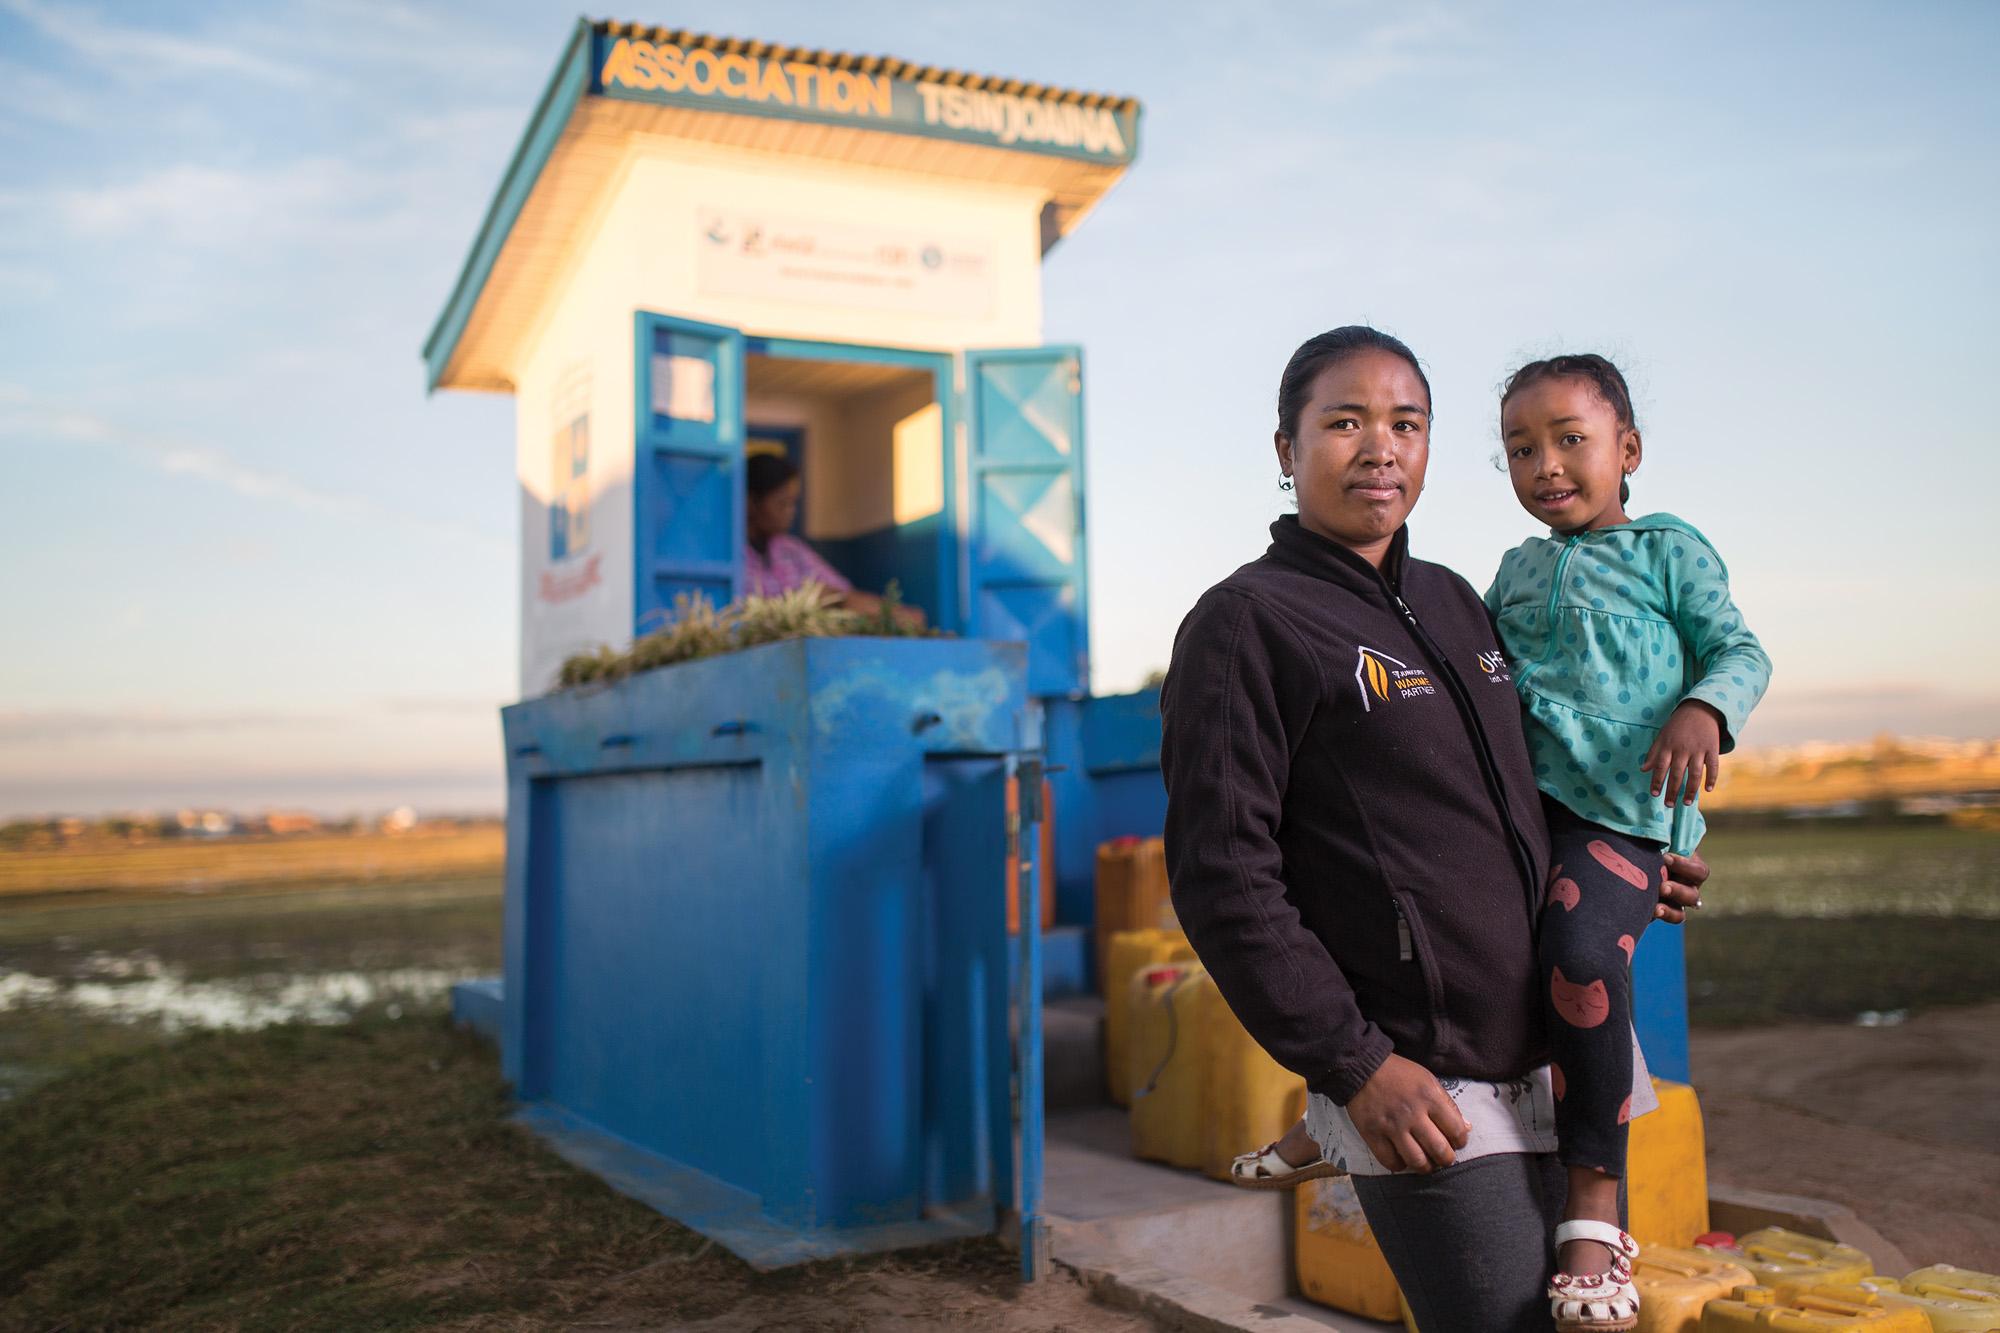 Water kiosk customer Antananarivo